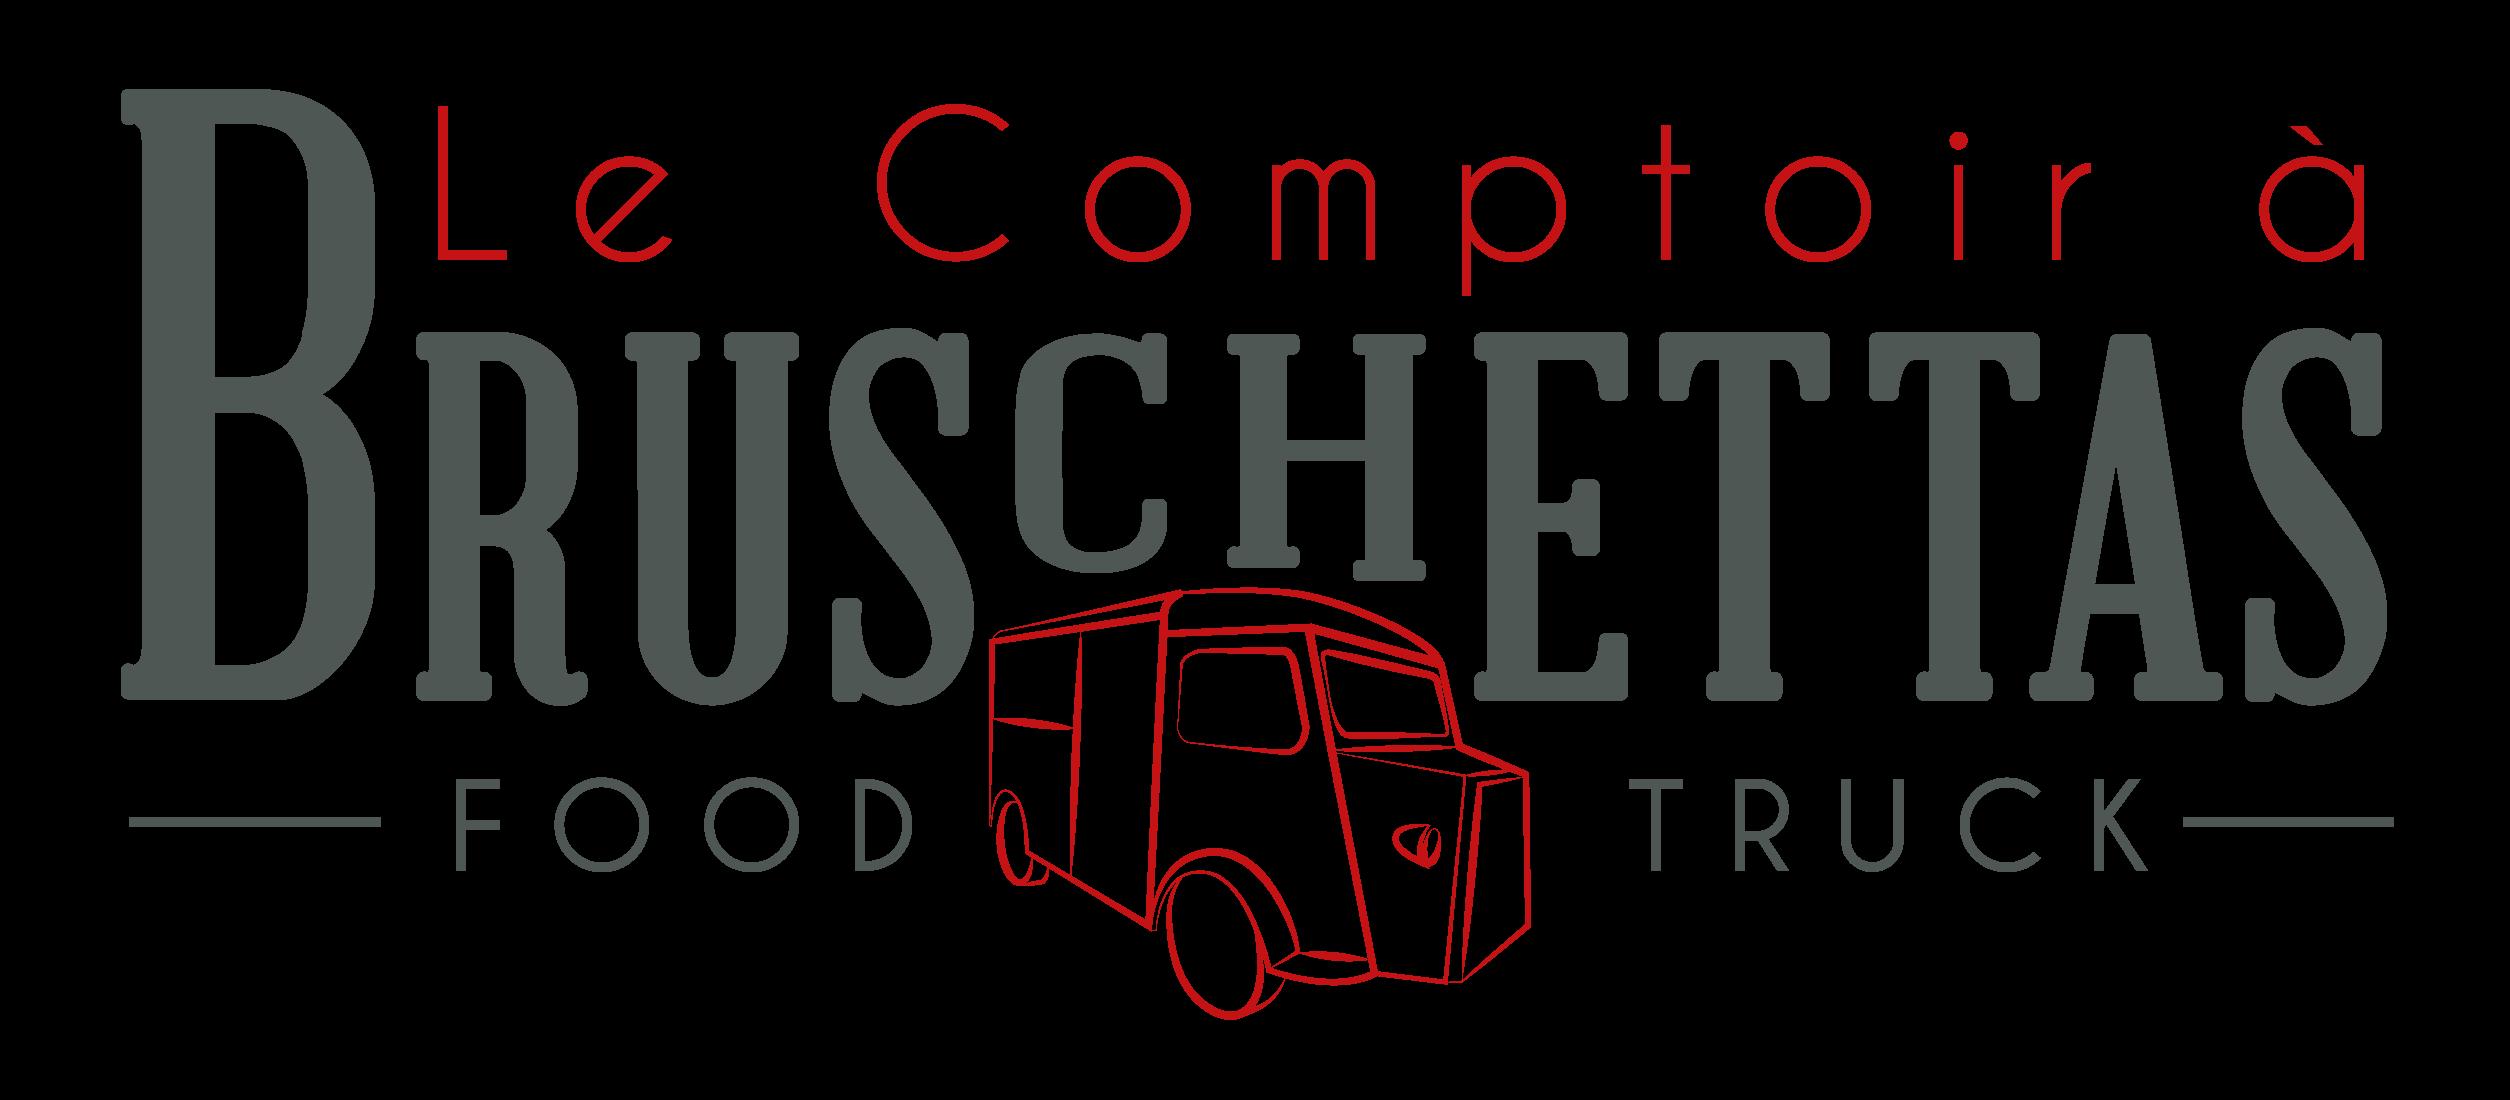 Le Comptoir à Bruschettas